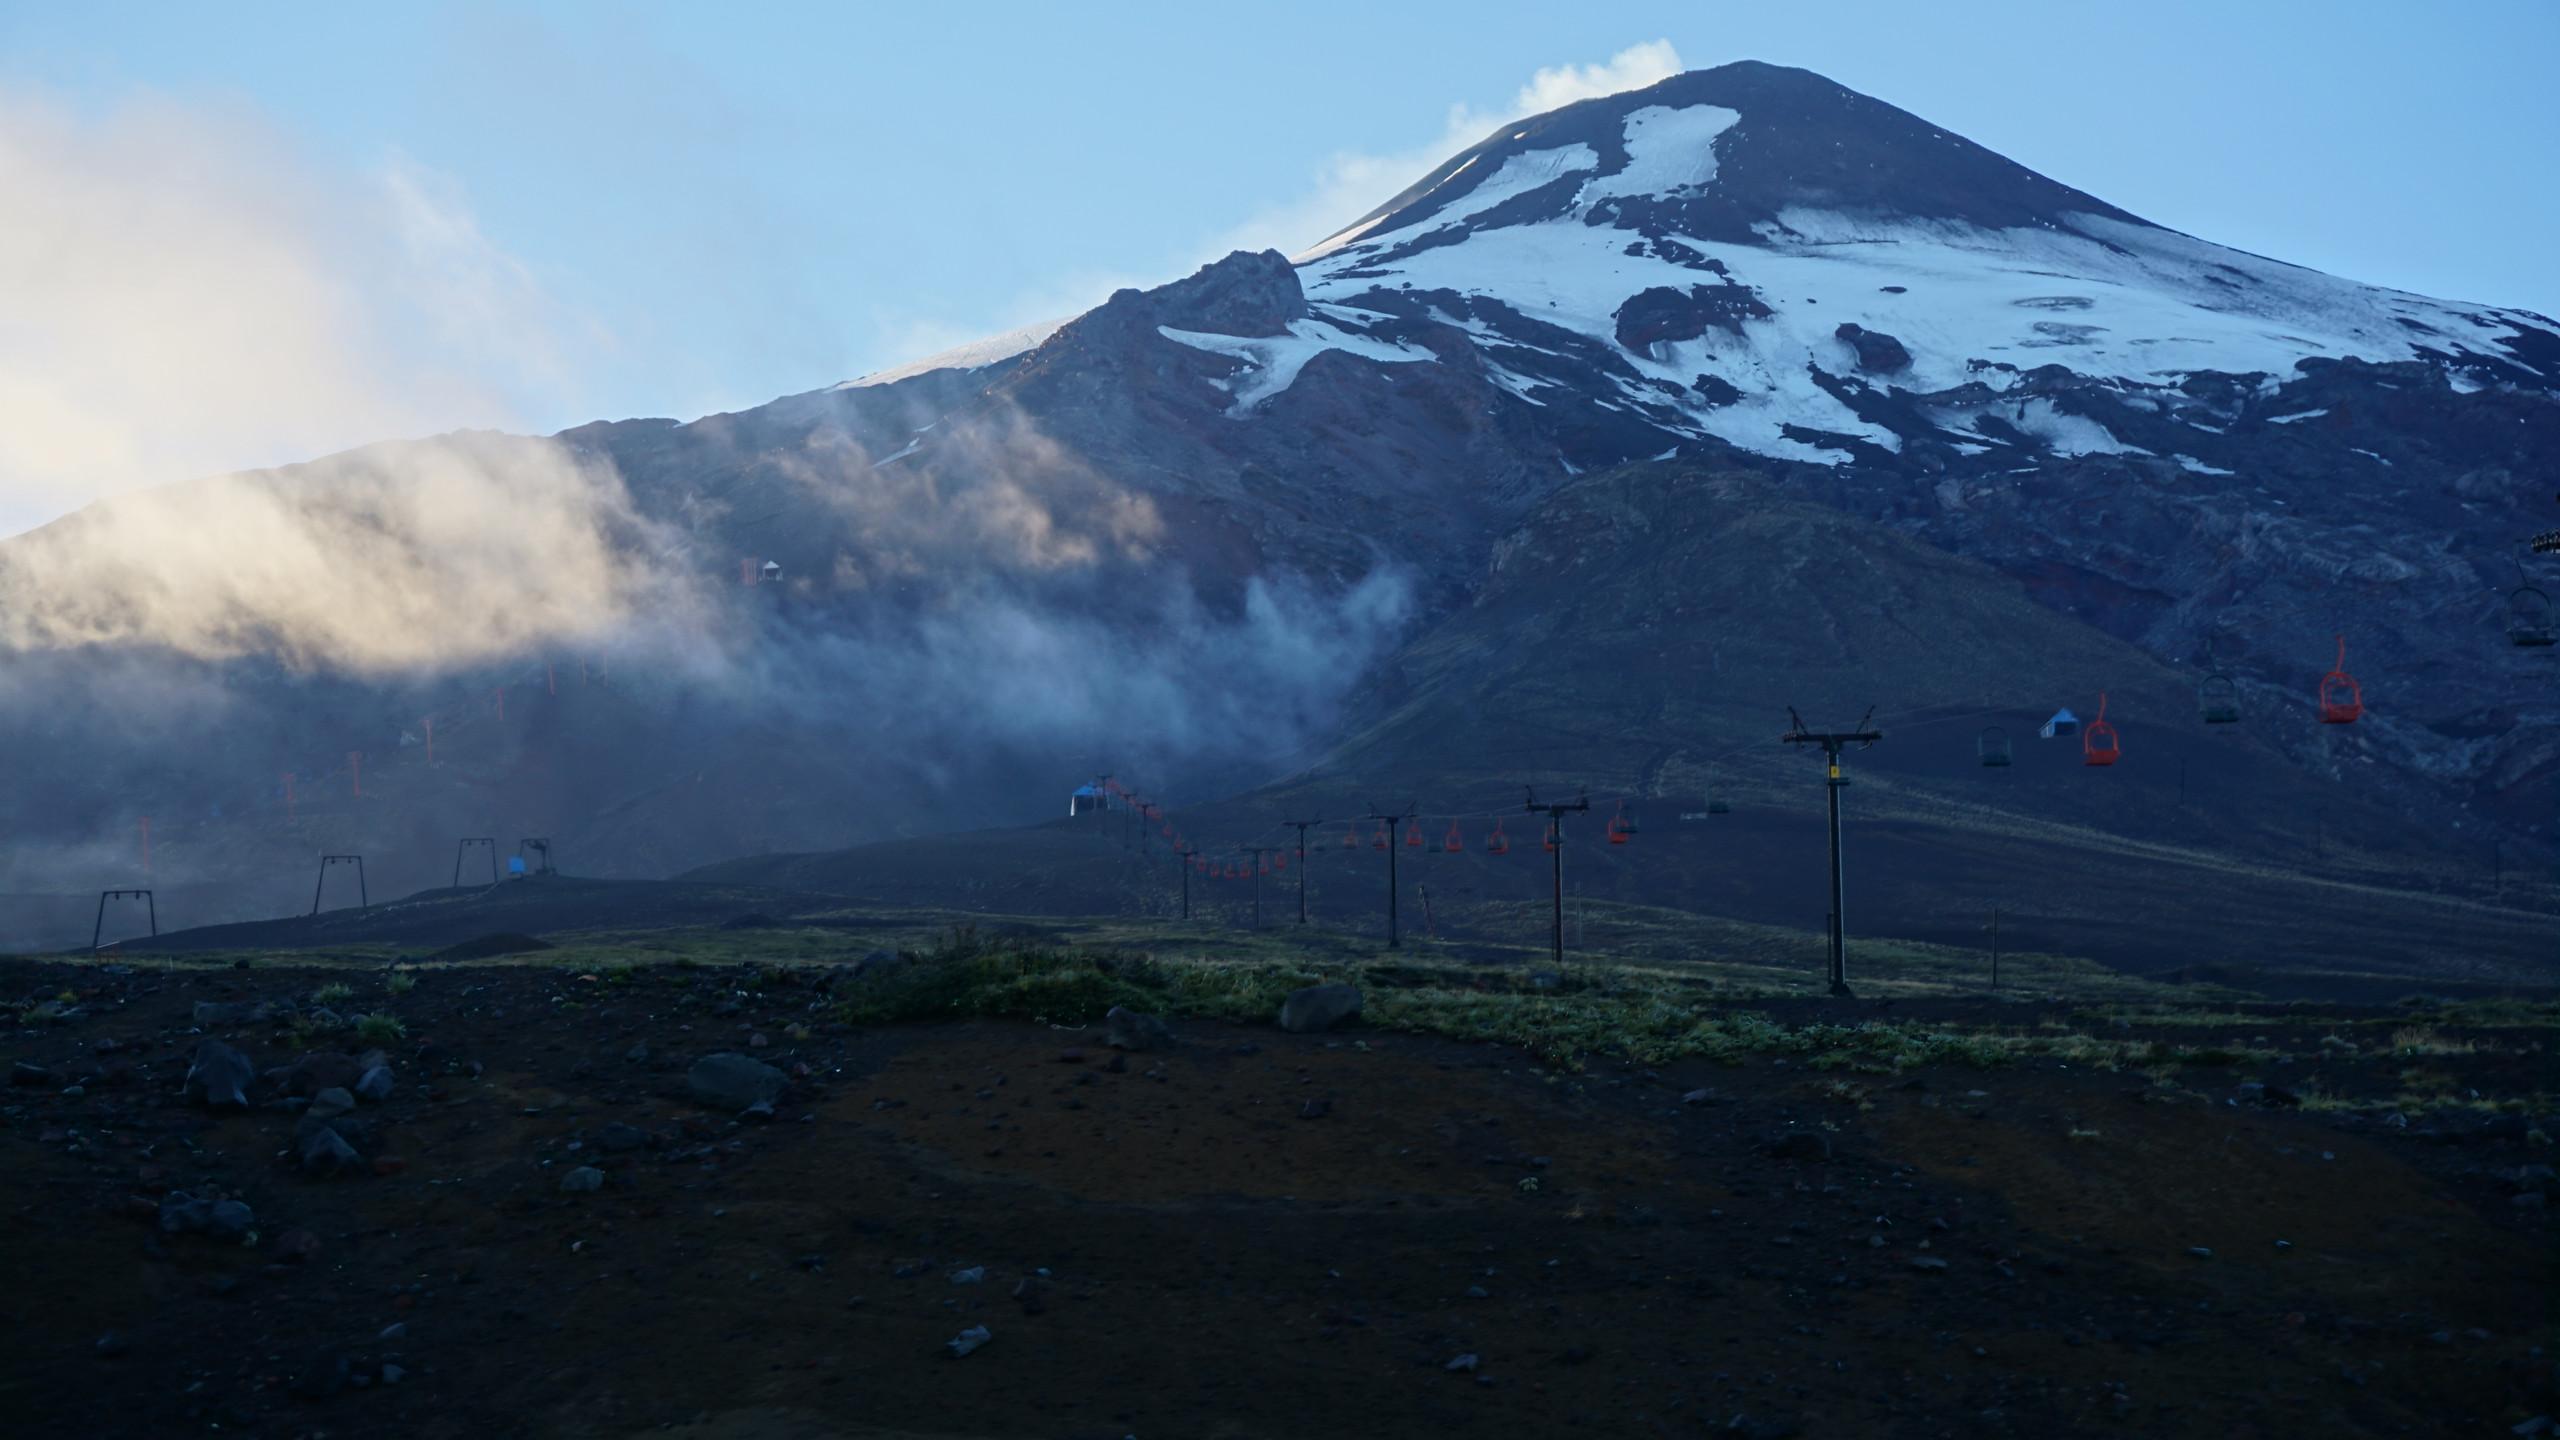 A view of Volcan Villarrica from below the ski resort